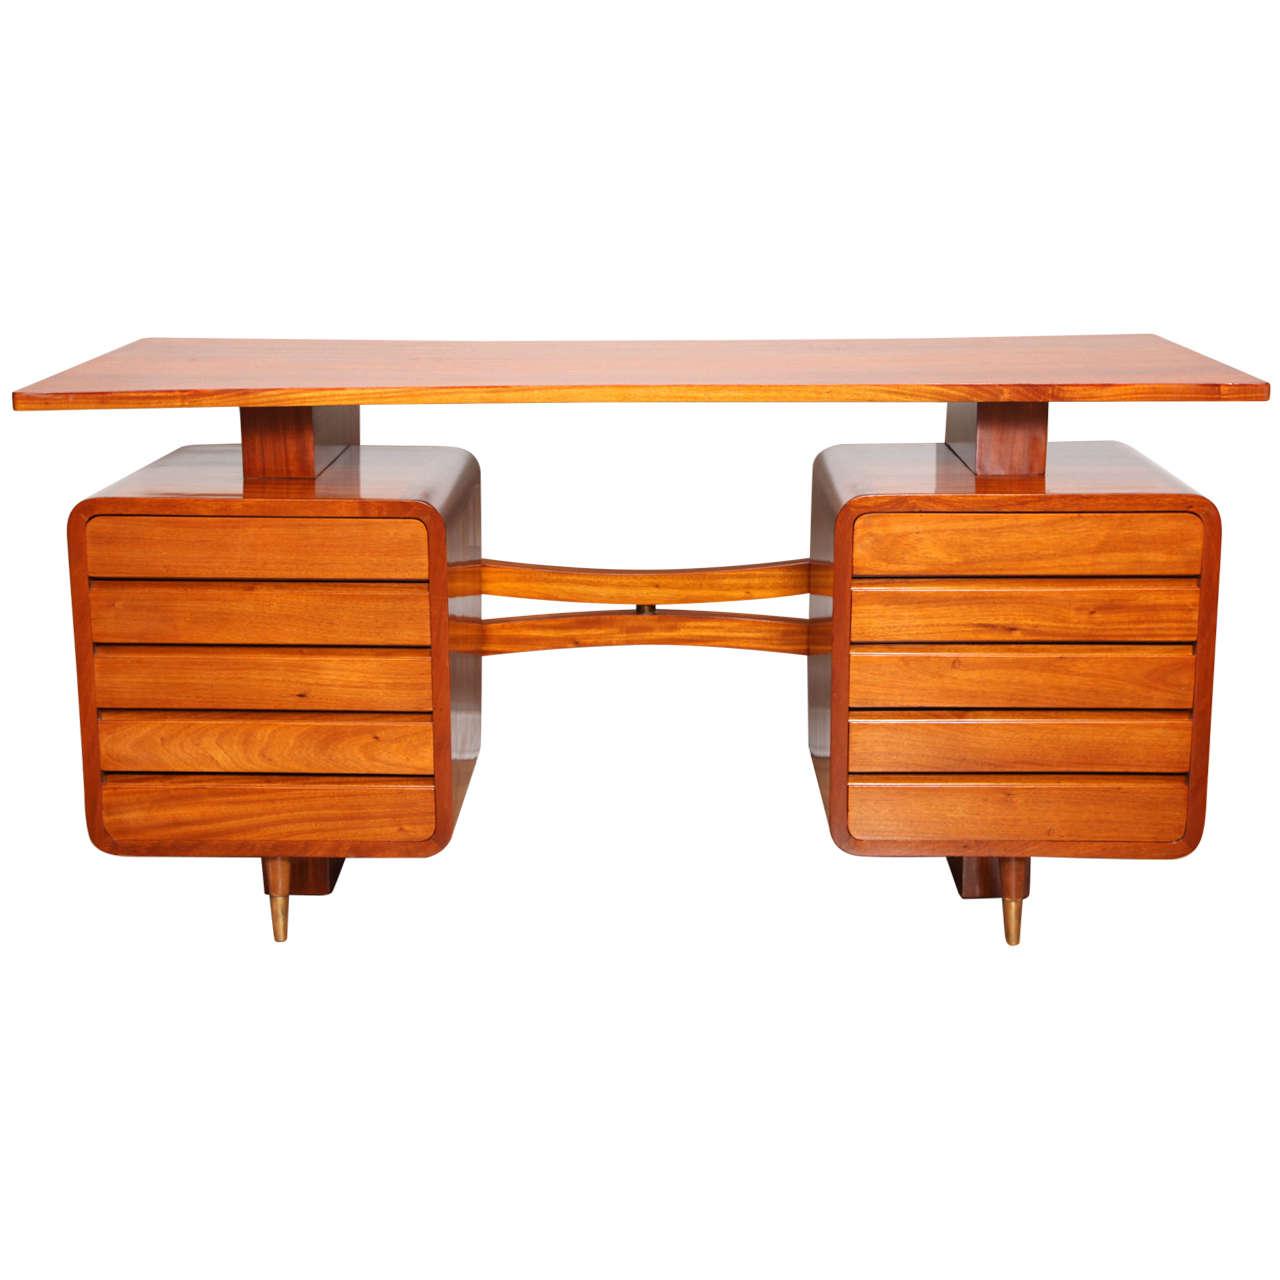 Mid Century Modern Desk: Extraordinary Mid-Century Modern Desk At 1stdibs